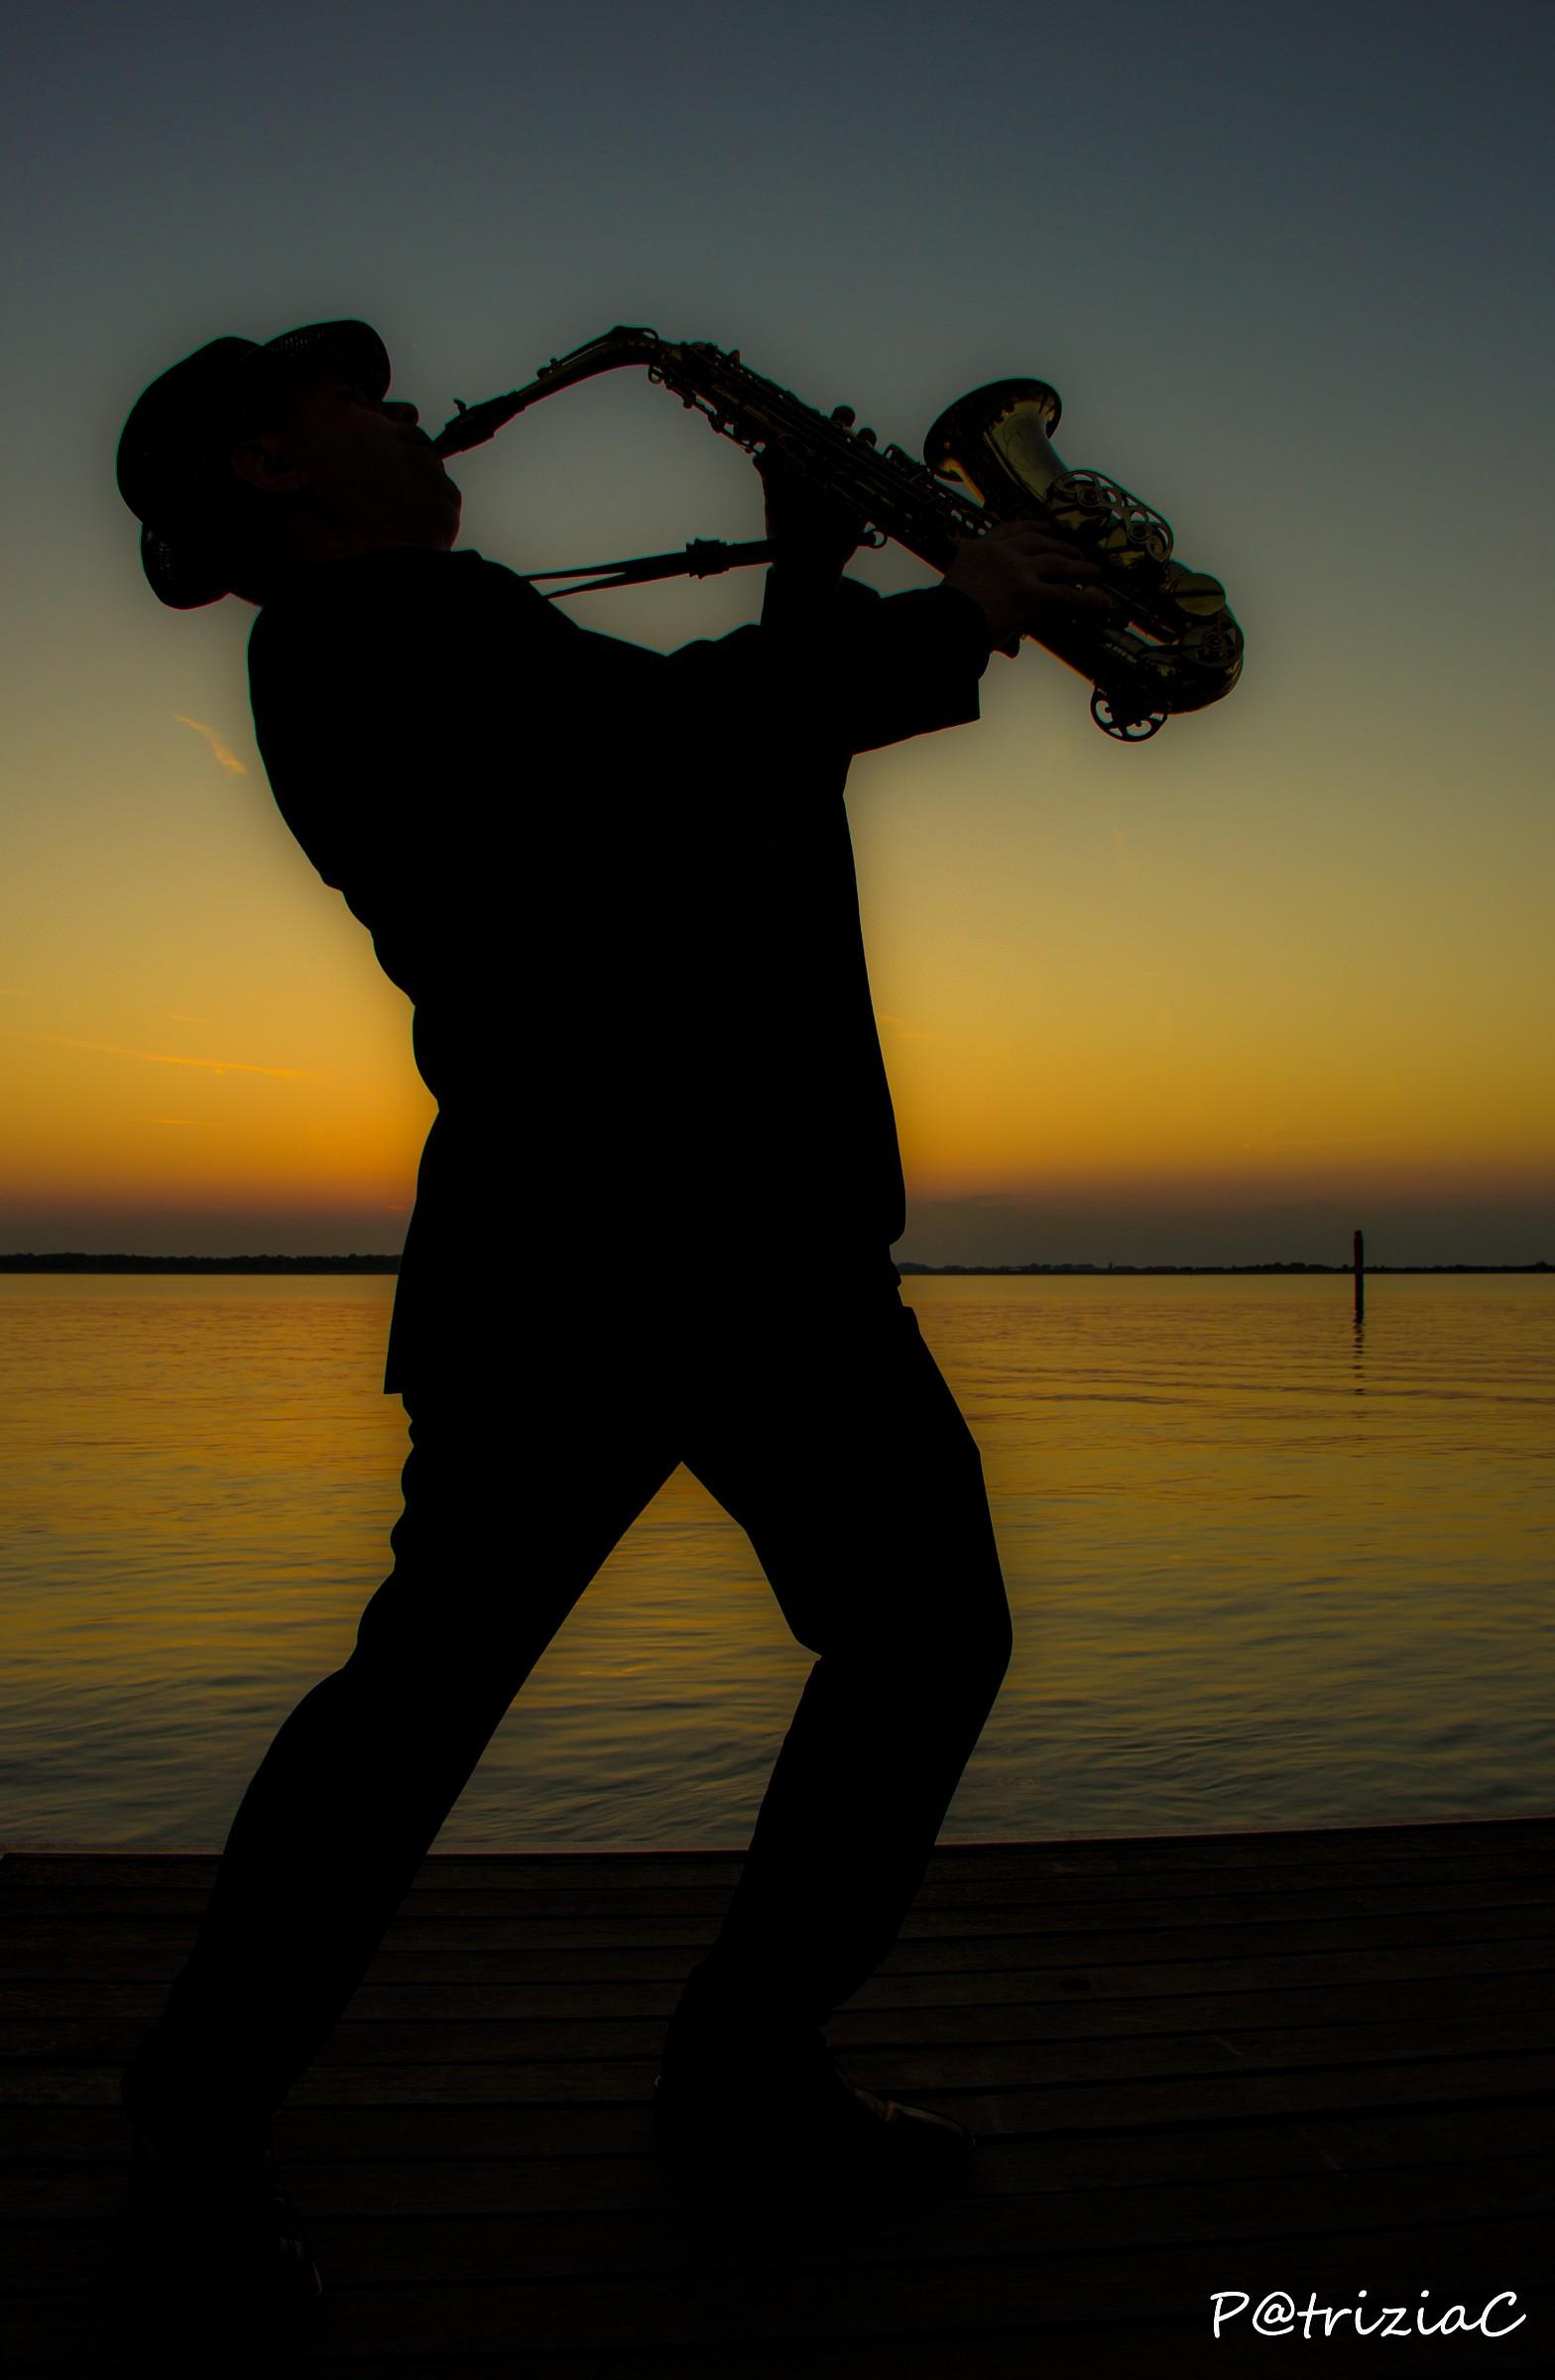 ... sunset&sax ......